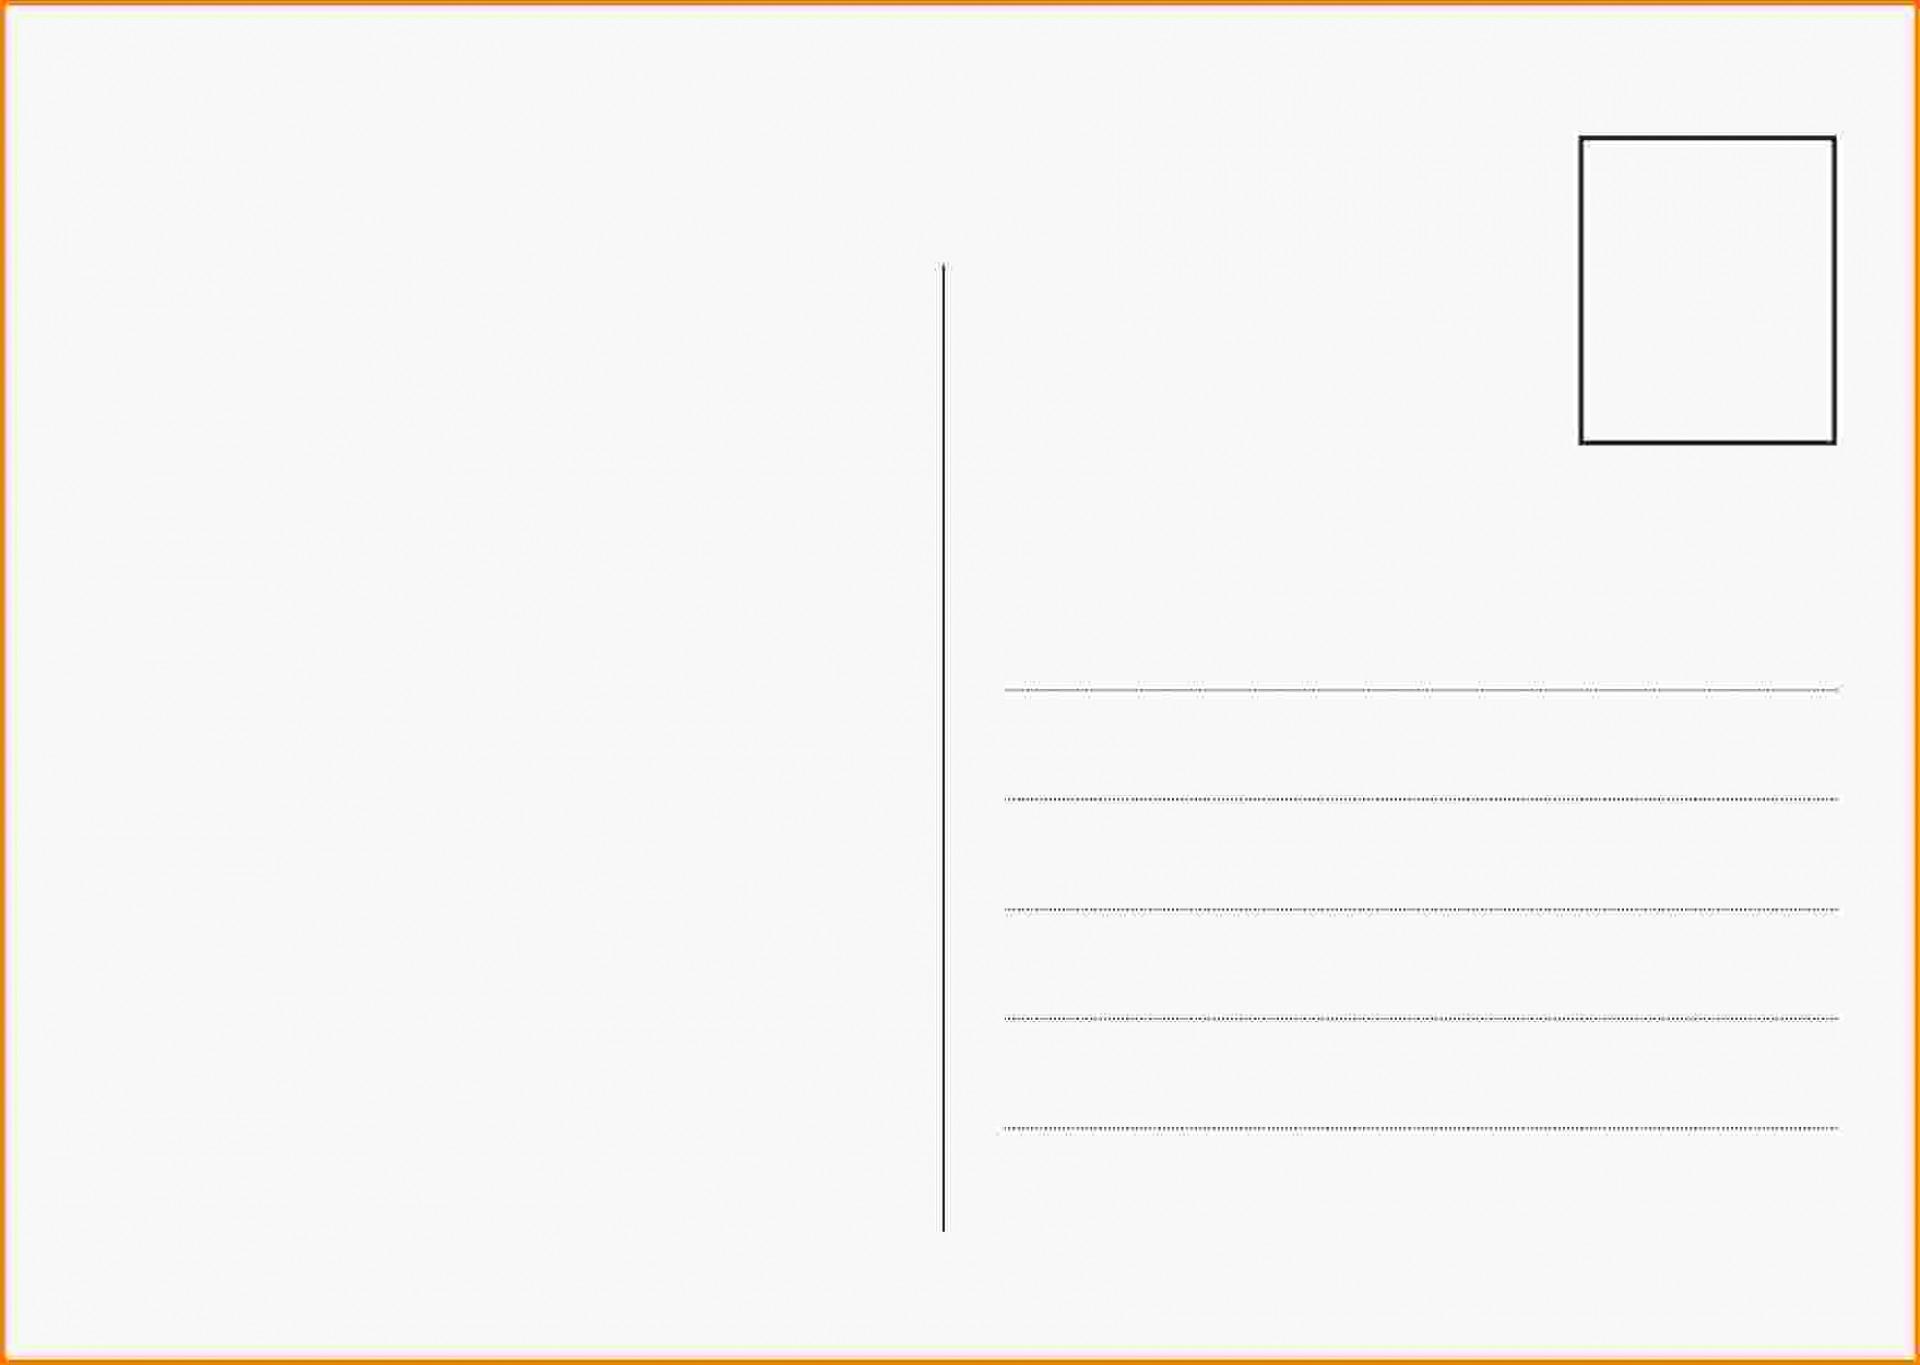 009 Template Ideas Postcard Free Download ~ Ulyssesroom - Free Blank Printable Postcards